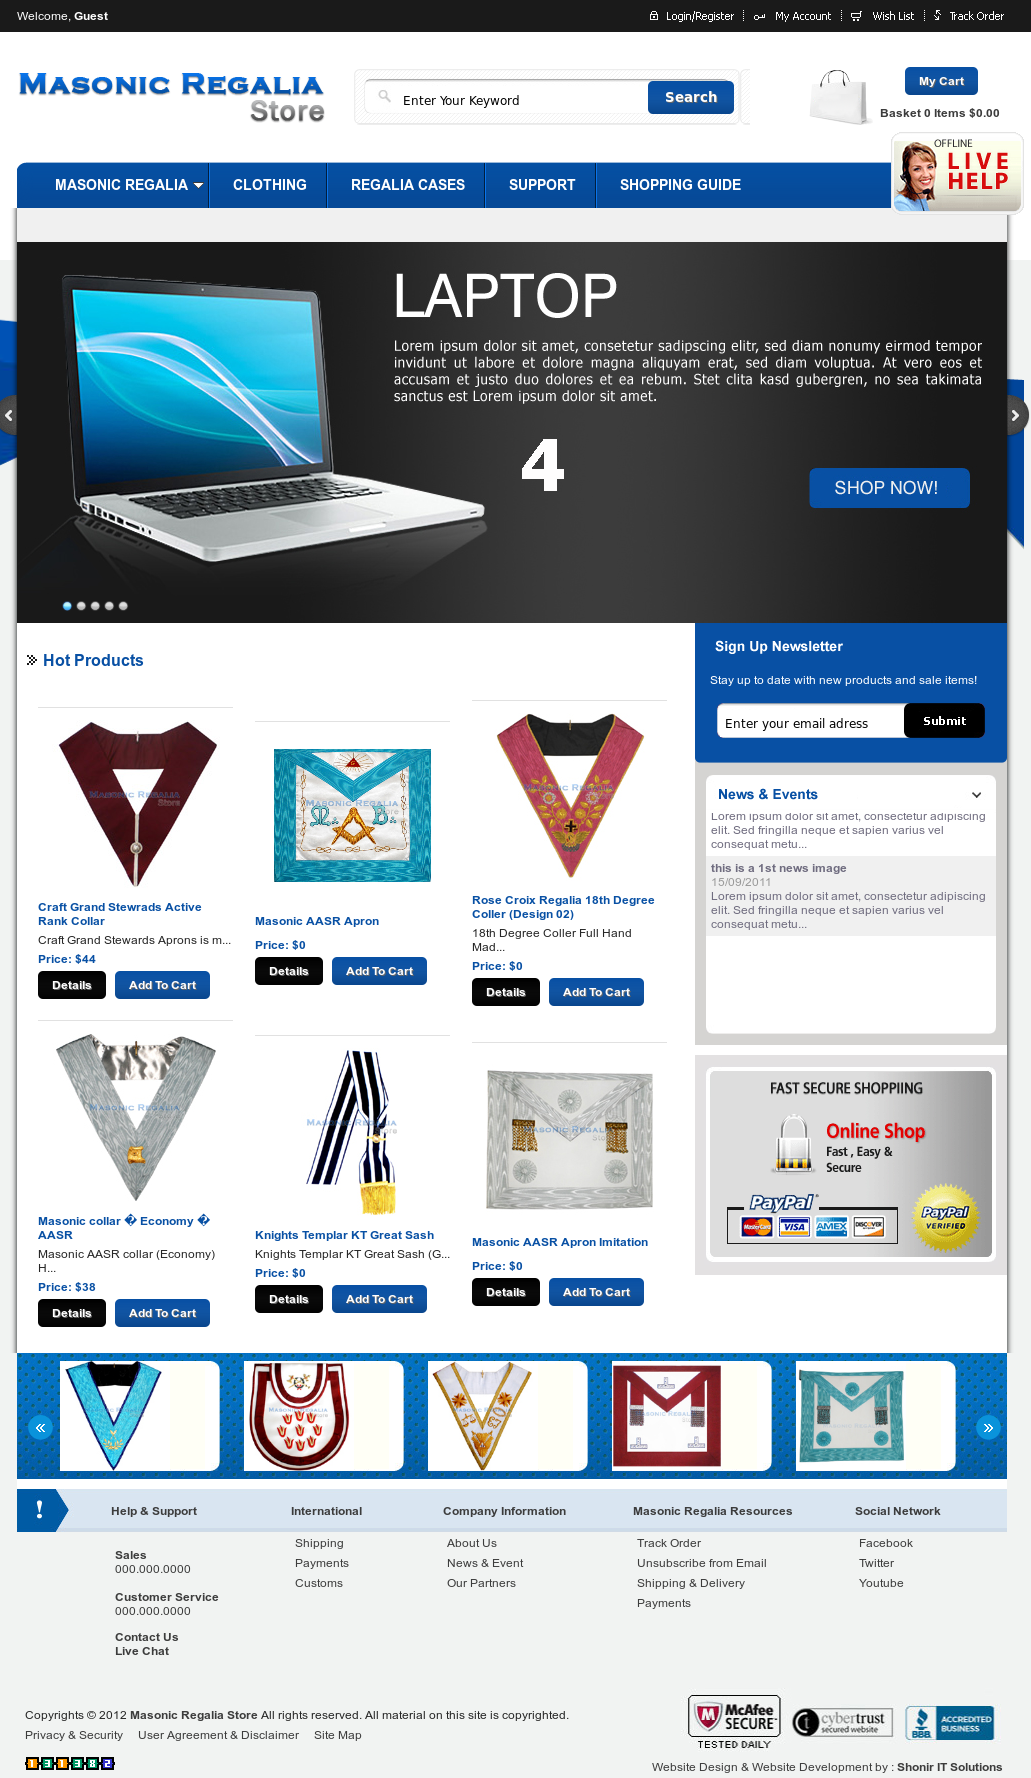 Masonic Regalia Store Competitors, Revenue and Employees